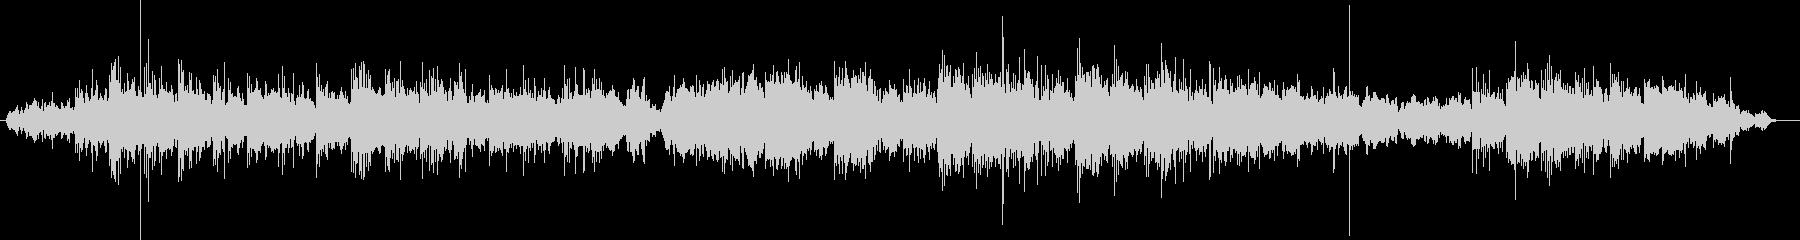 Mysterious slow tempo BGM's unreproduced waveform